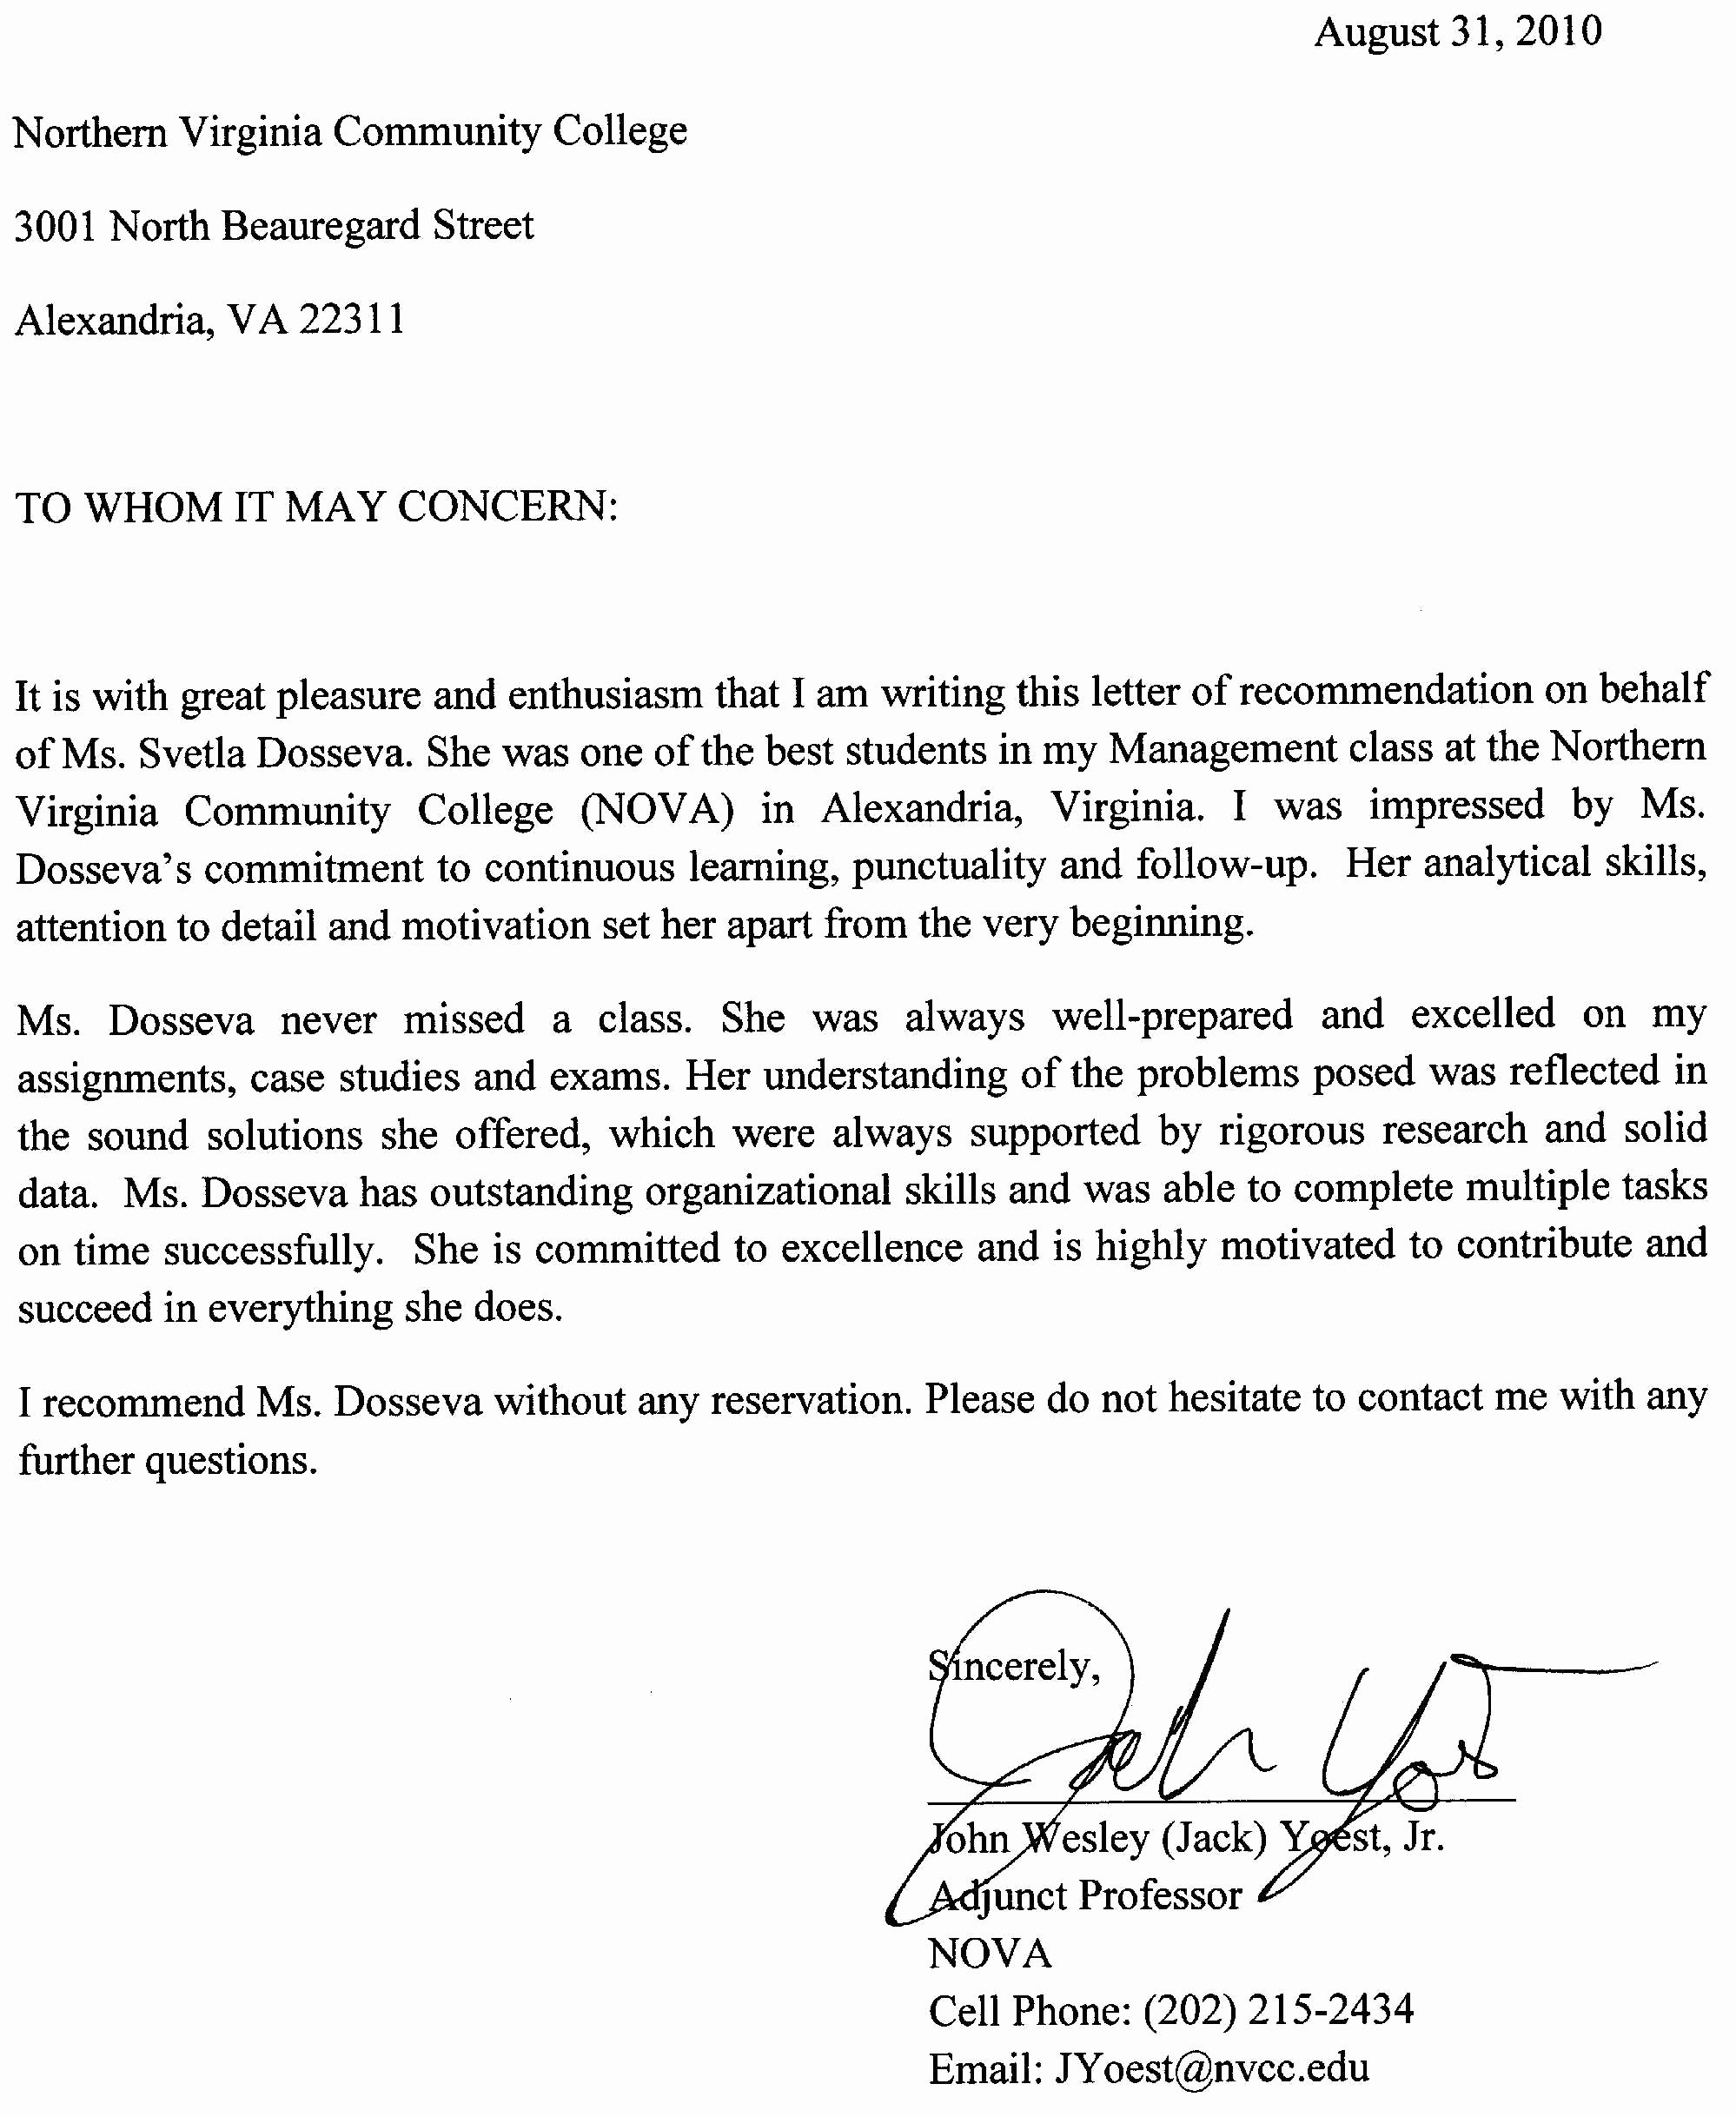 Letter Of Recomendation for Employment Fresh Re Mendation Letter Job Application Sample